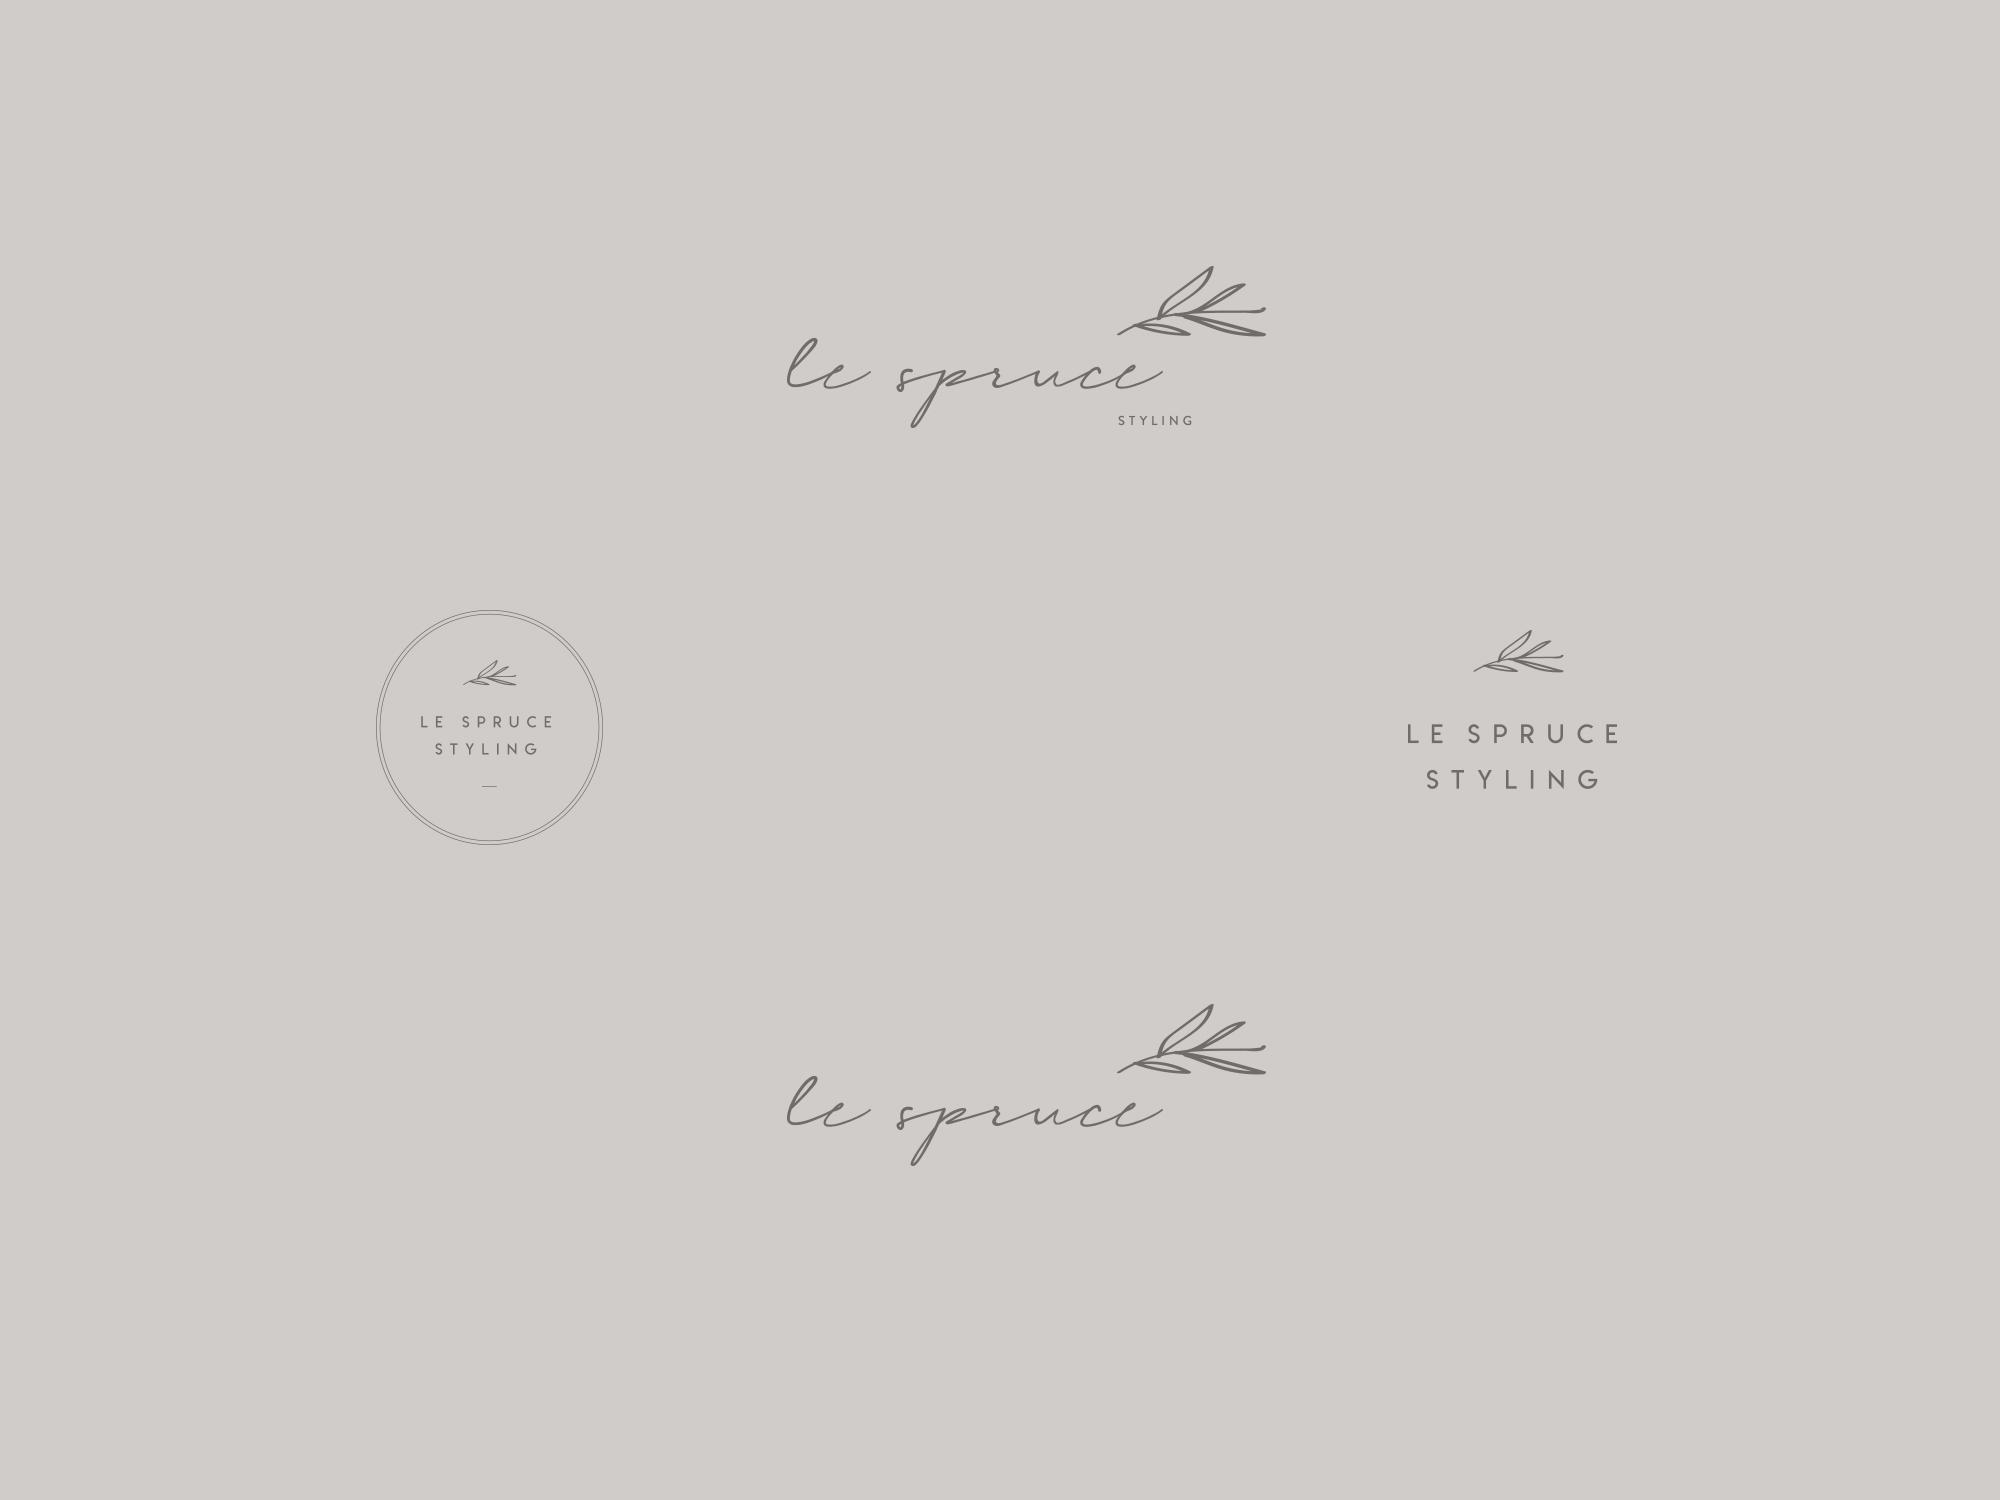 LeSpruce-2.jpg